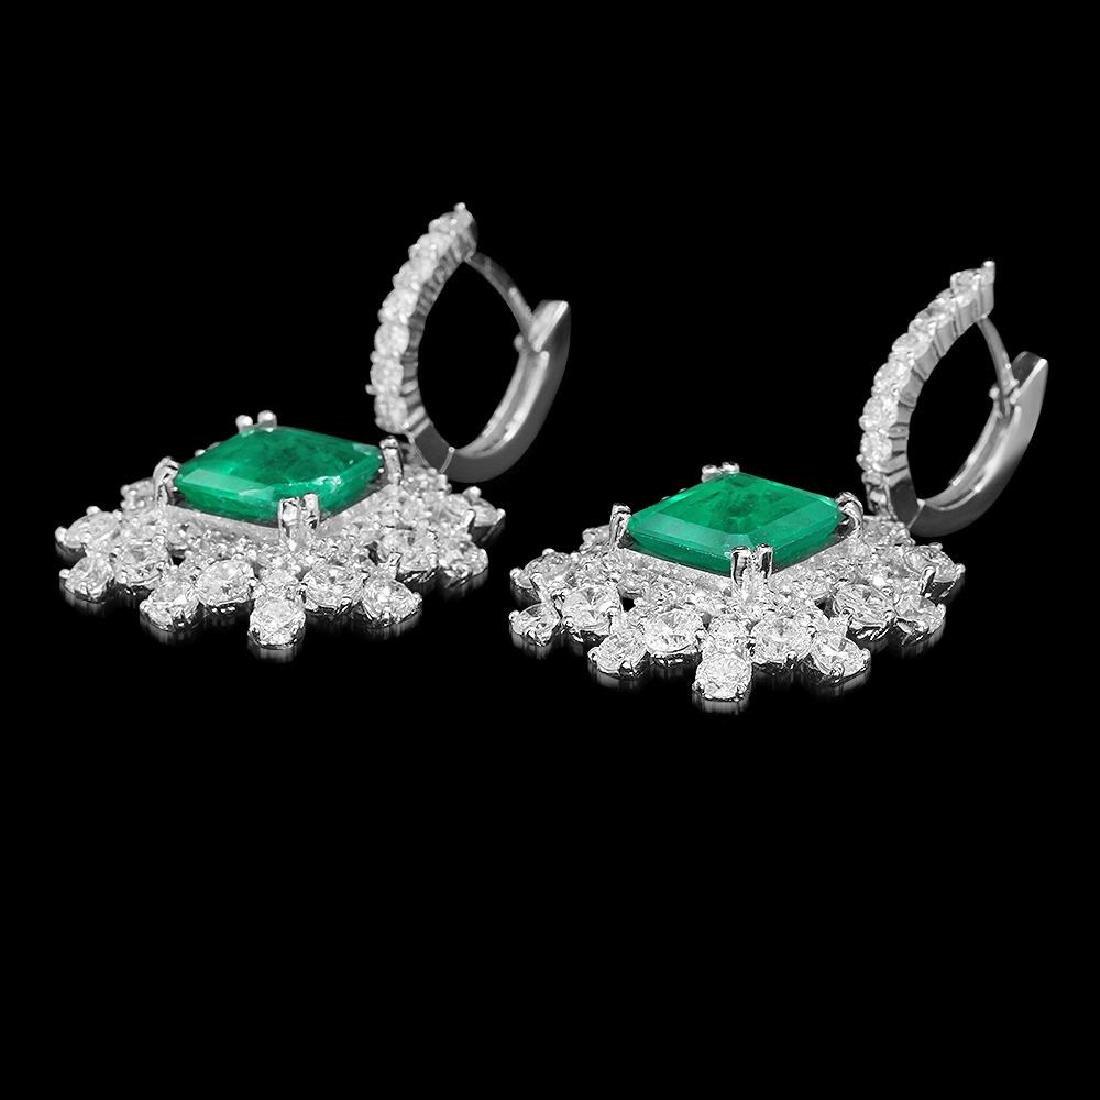 14K Gold 5.68ct Emerald 5.75ct Diamond Earrings - 2